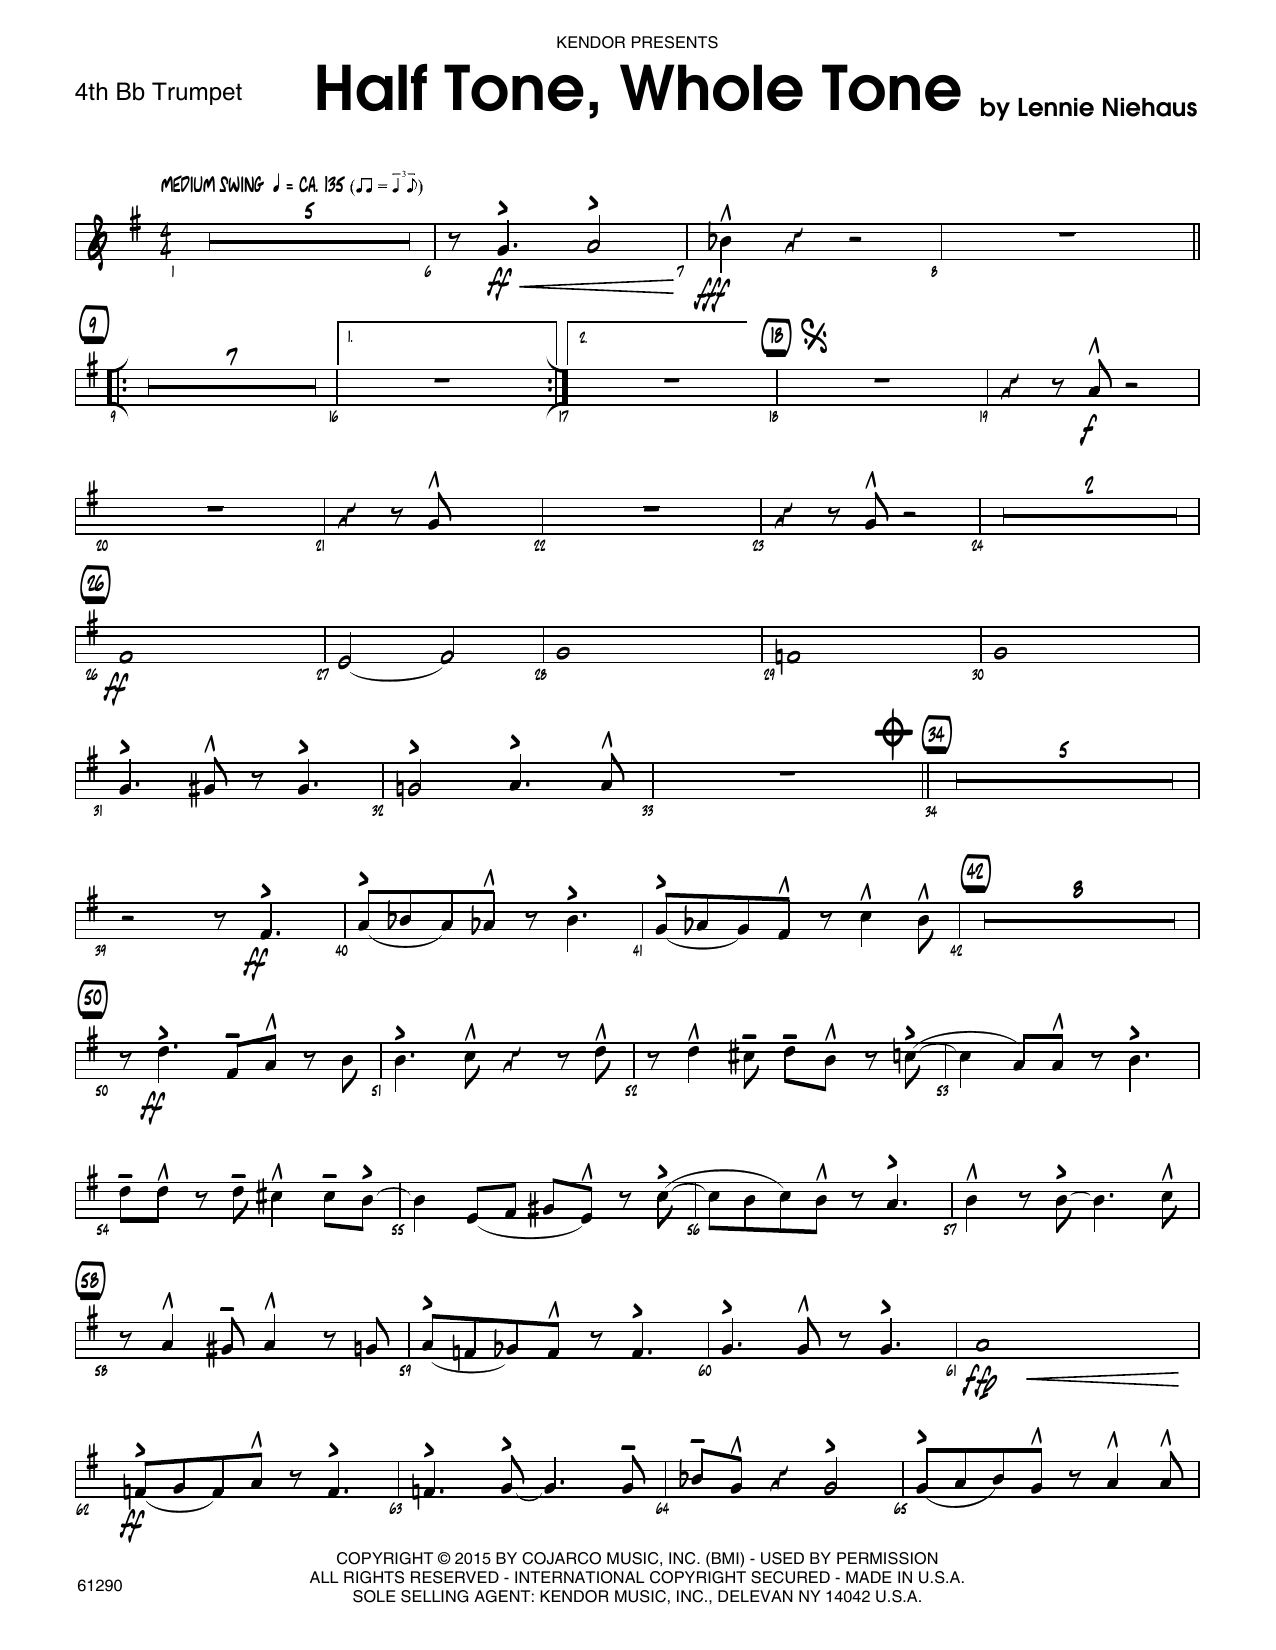 Half Tone, Whole Tone - 4th Bb Trumpet Sheet Music